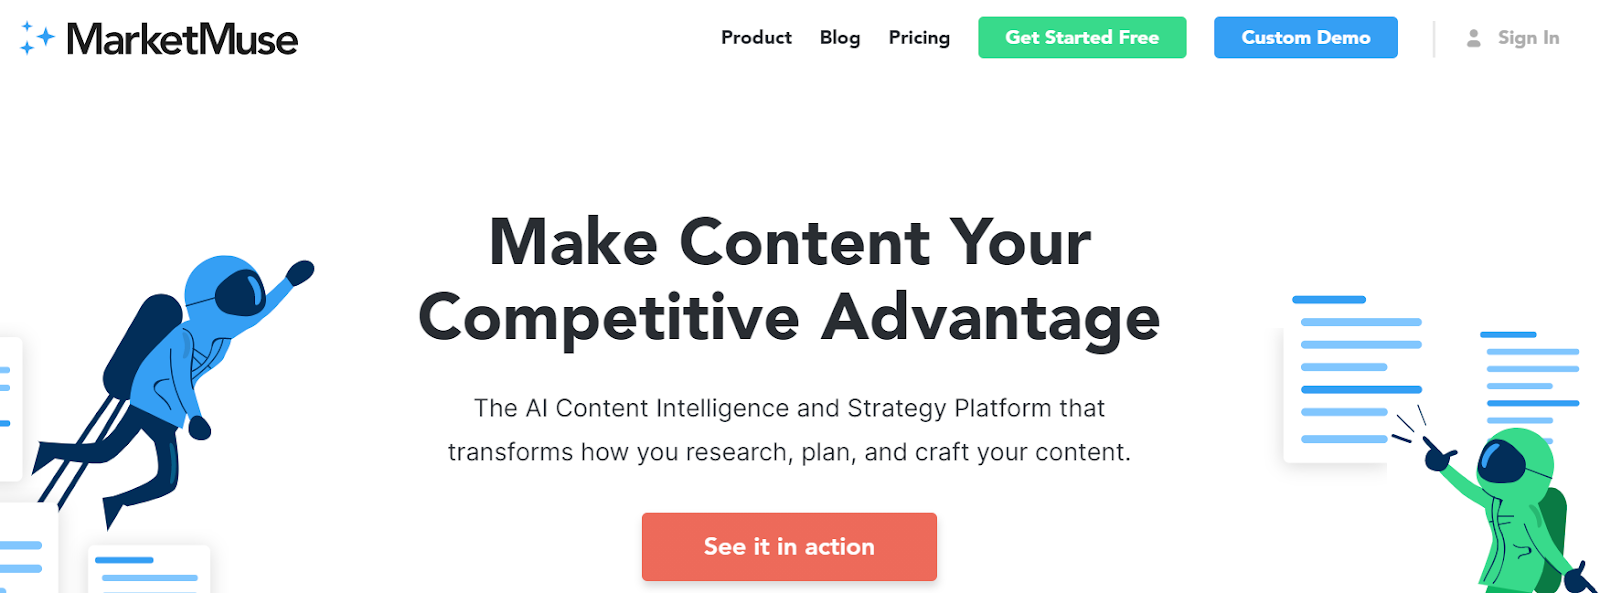 MarketMuse content optimization tool